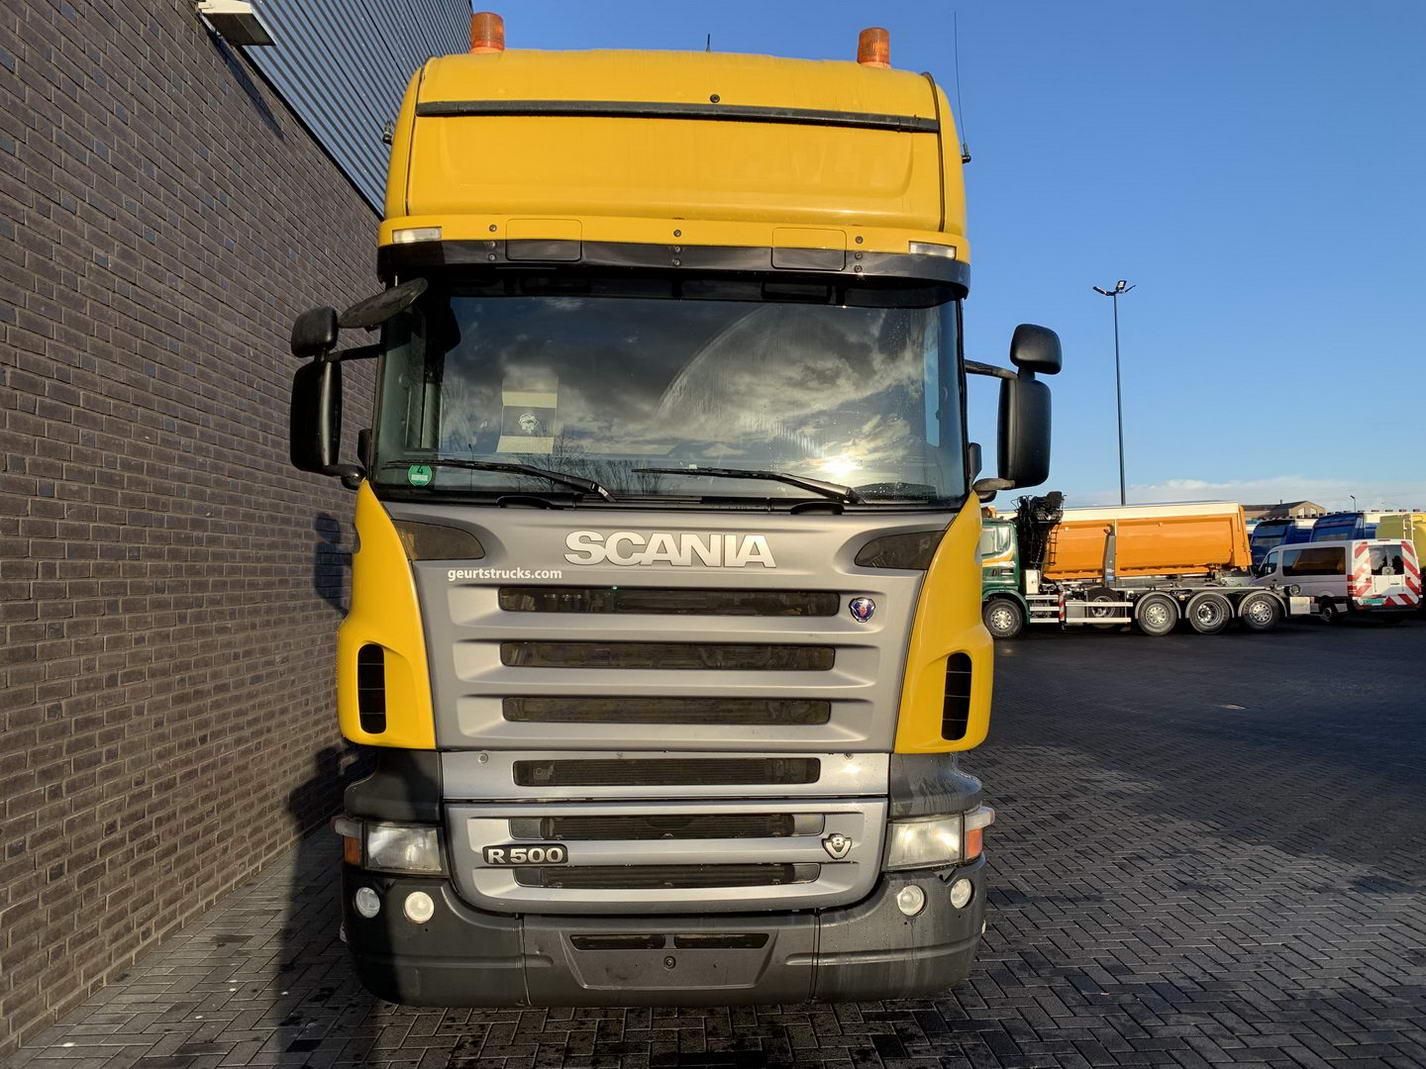 SCANIA R500 LA 8X4 HNC 2008 (9)